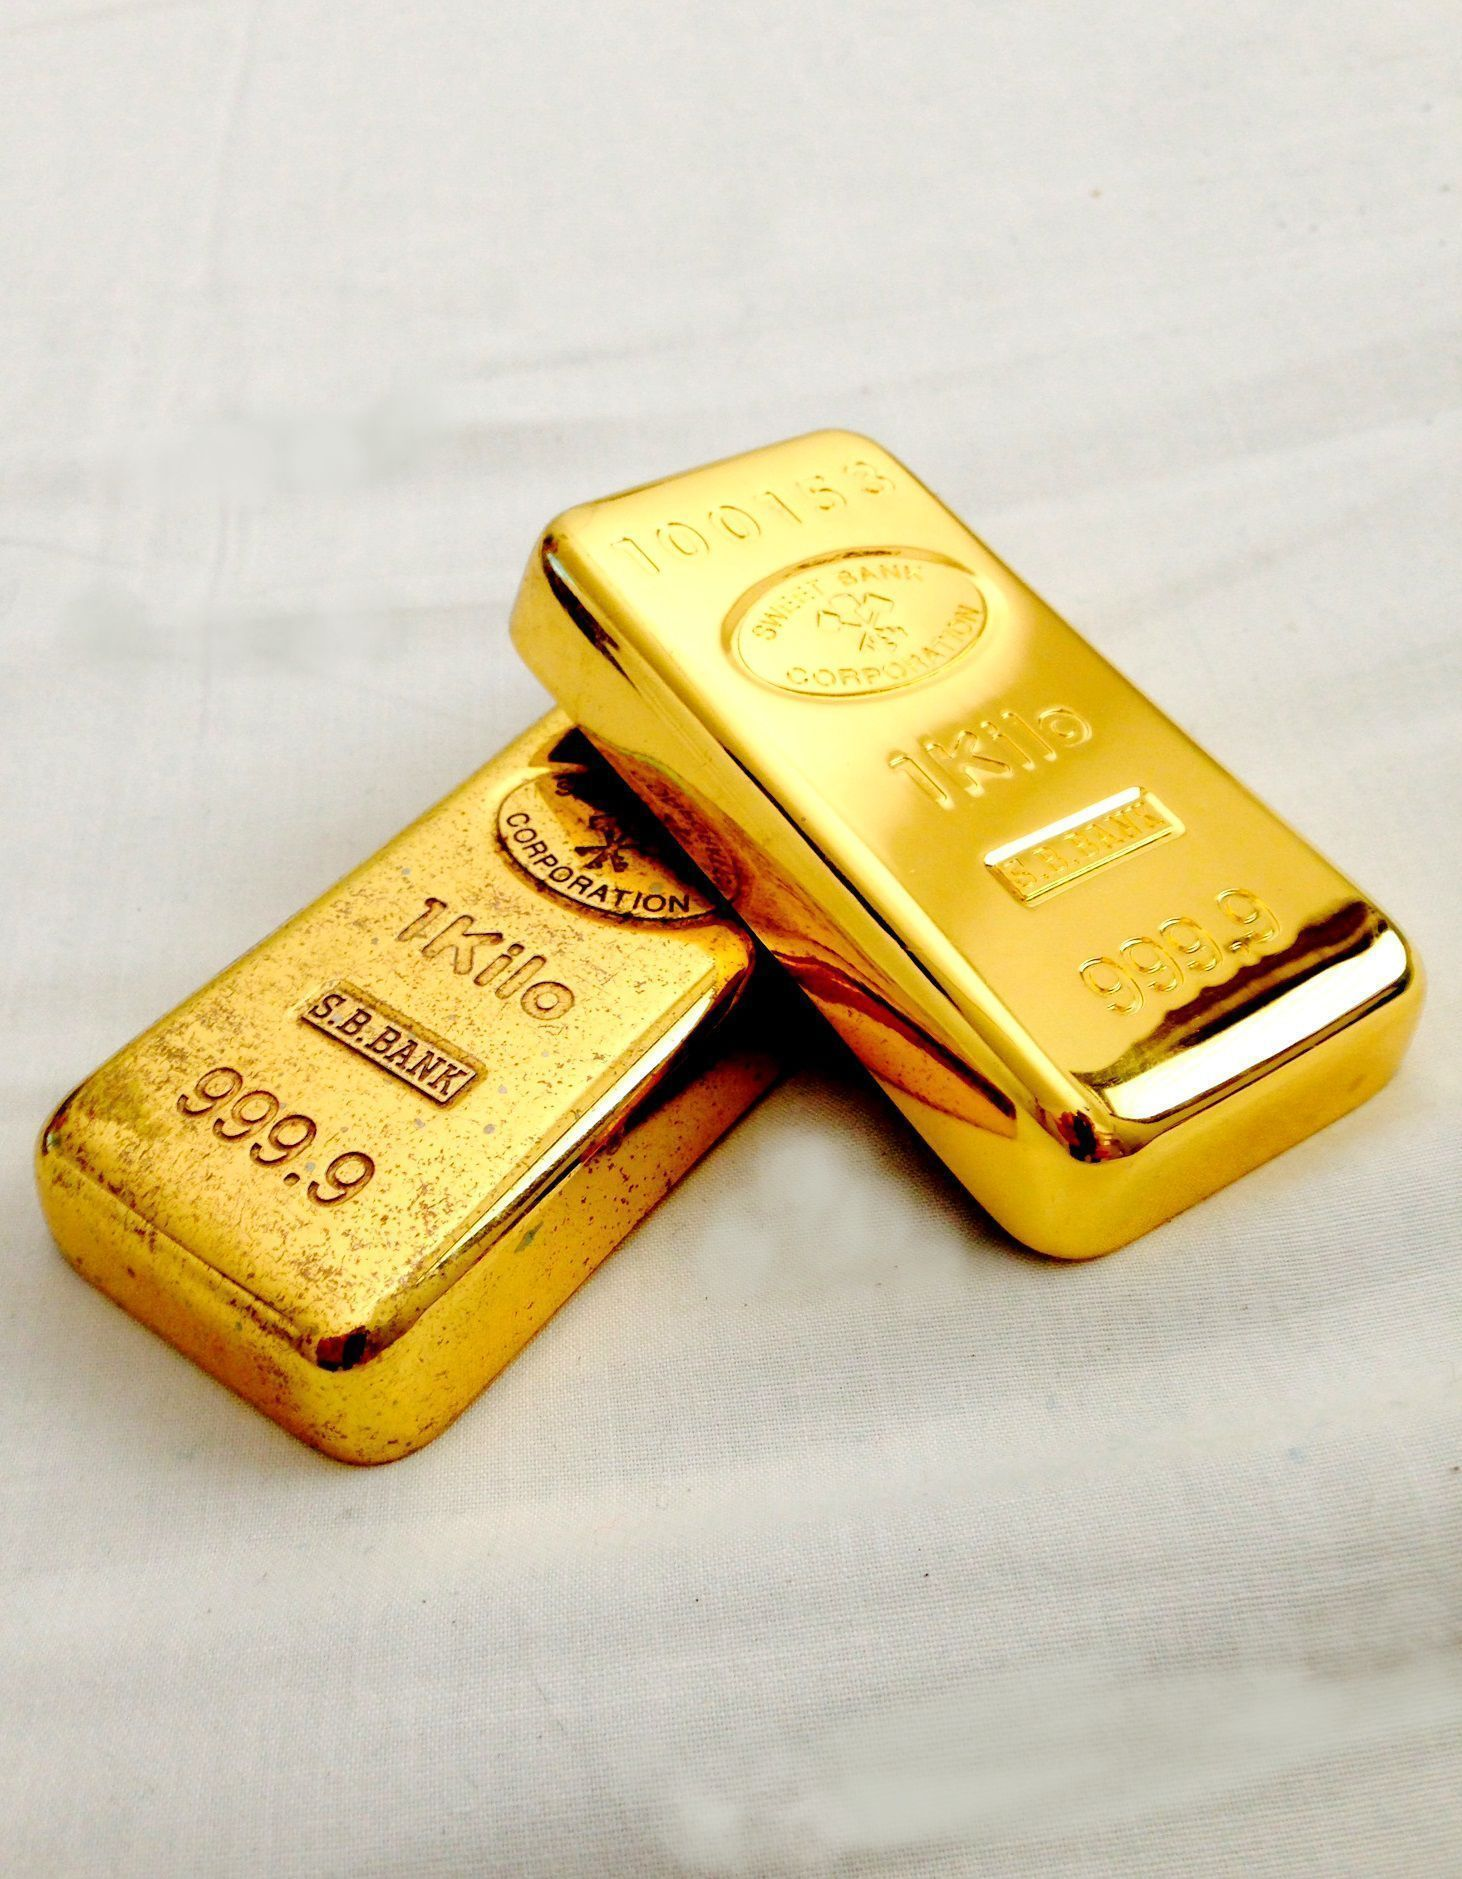 Gold (Metal) #GoldInvesting #GoldInvestment #GoldCoins | Lingotes de plata,  Lingotes de oro, Abundancia